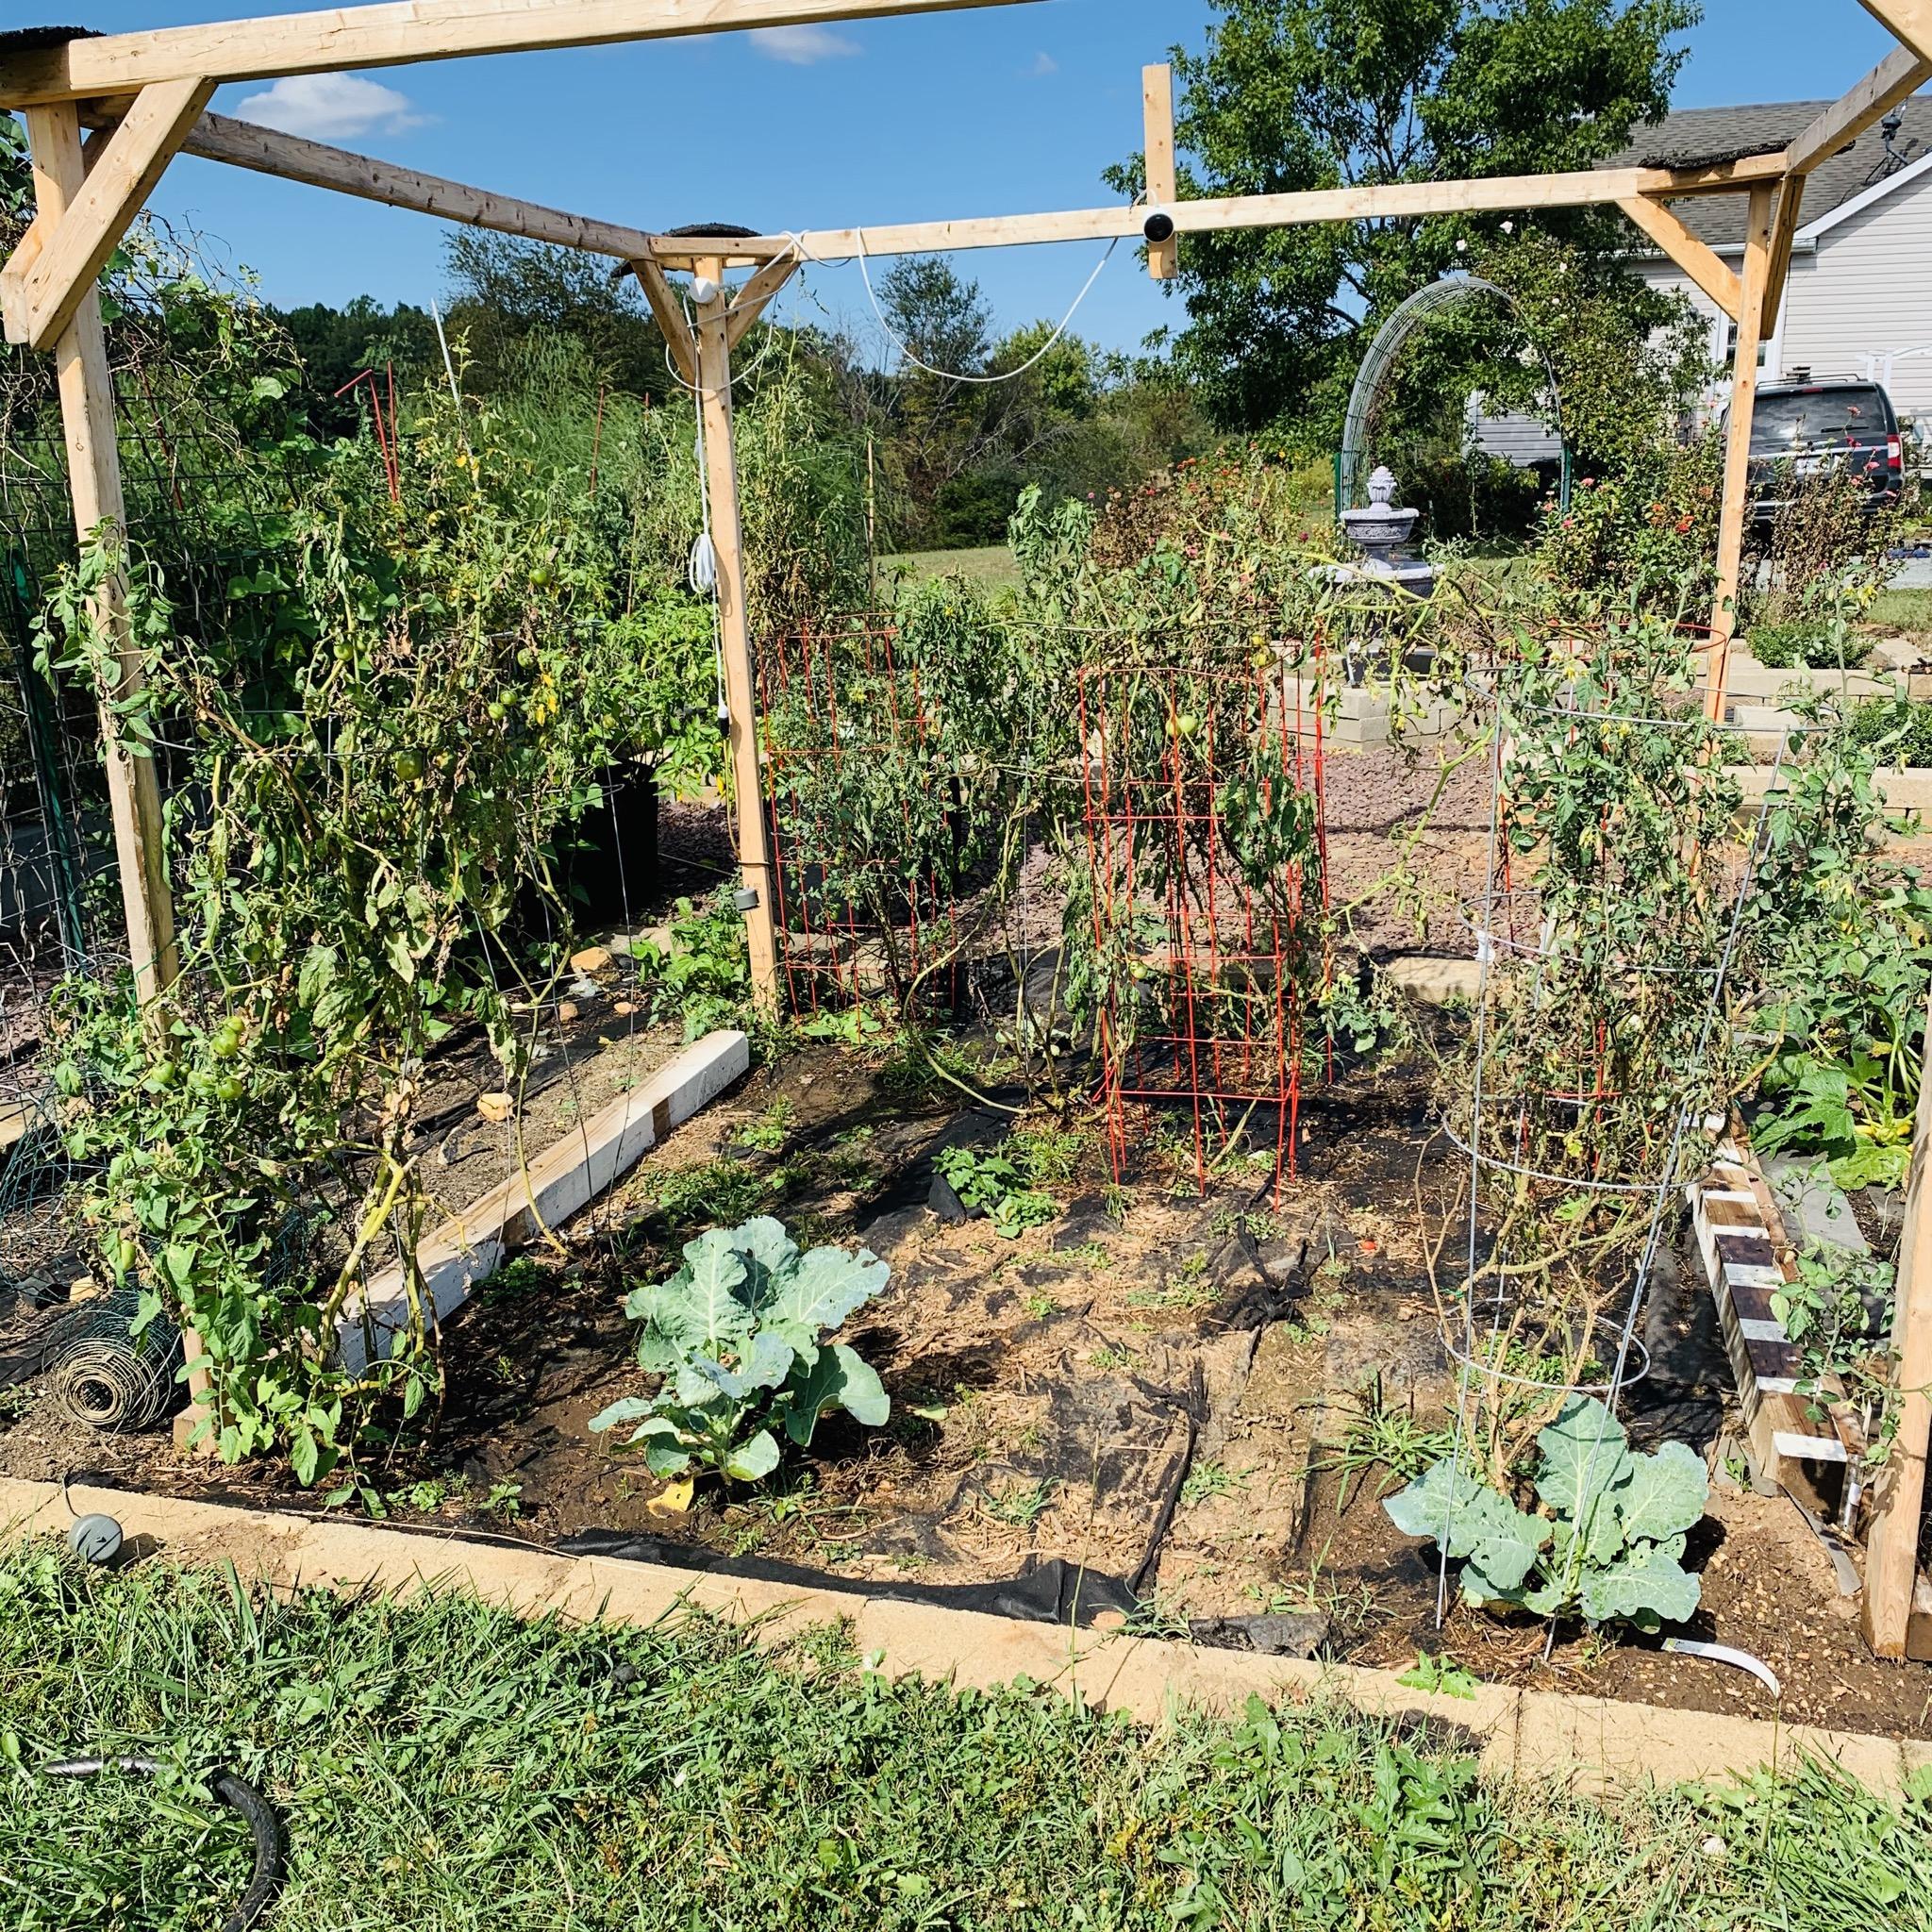 662EE47F 7D37 4E7A B479 3AFD53B532DF The garden is still producing